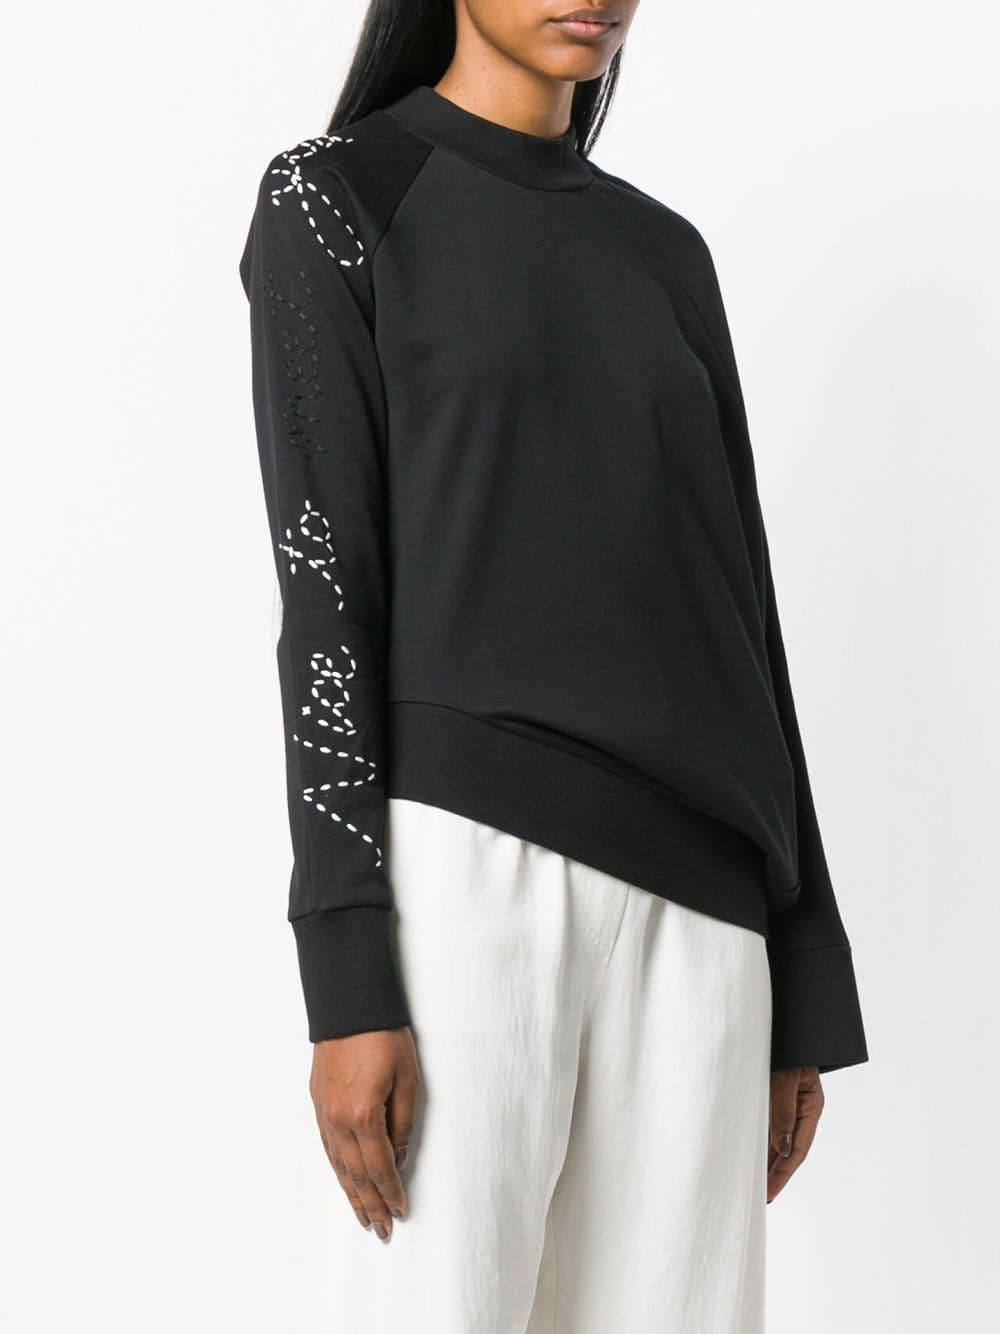 868d8bf1d Y-3 - Black Adidas X Yohji Yamamoto Angled Waist Slogan Sweater - Lyst.  View fullscreen